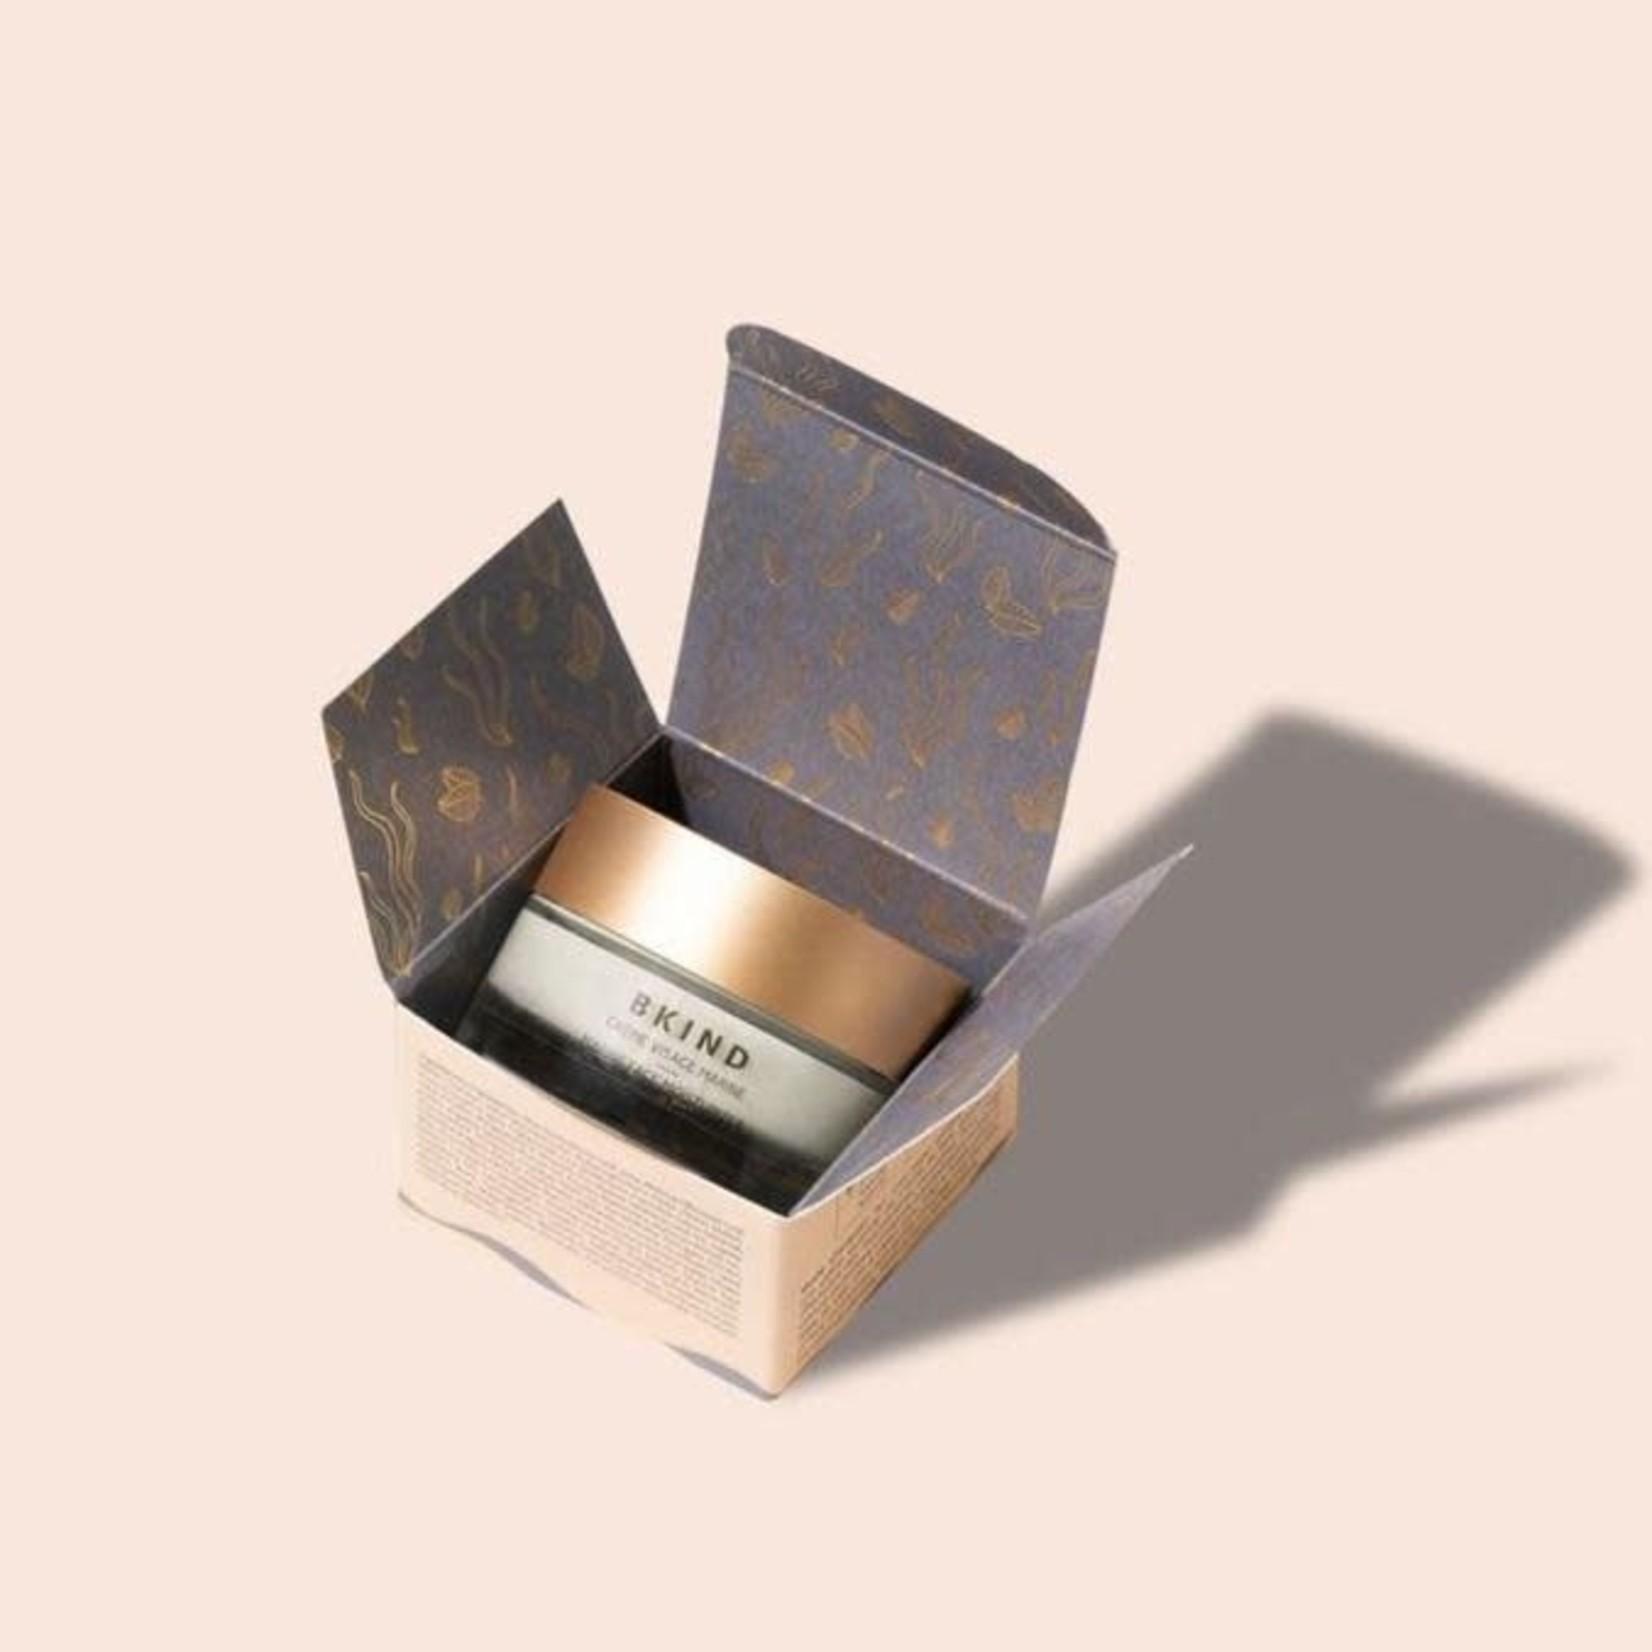 BKIND BKIND - Crème visage hydratante / Algues marines